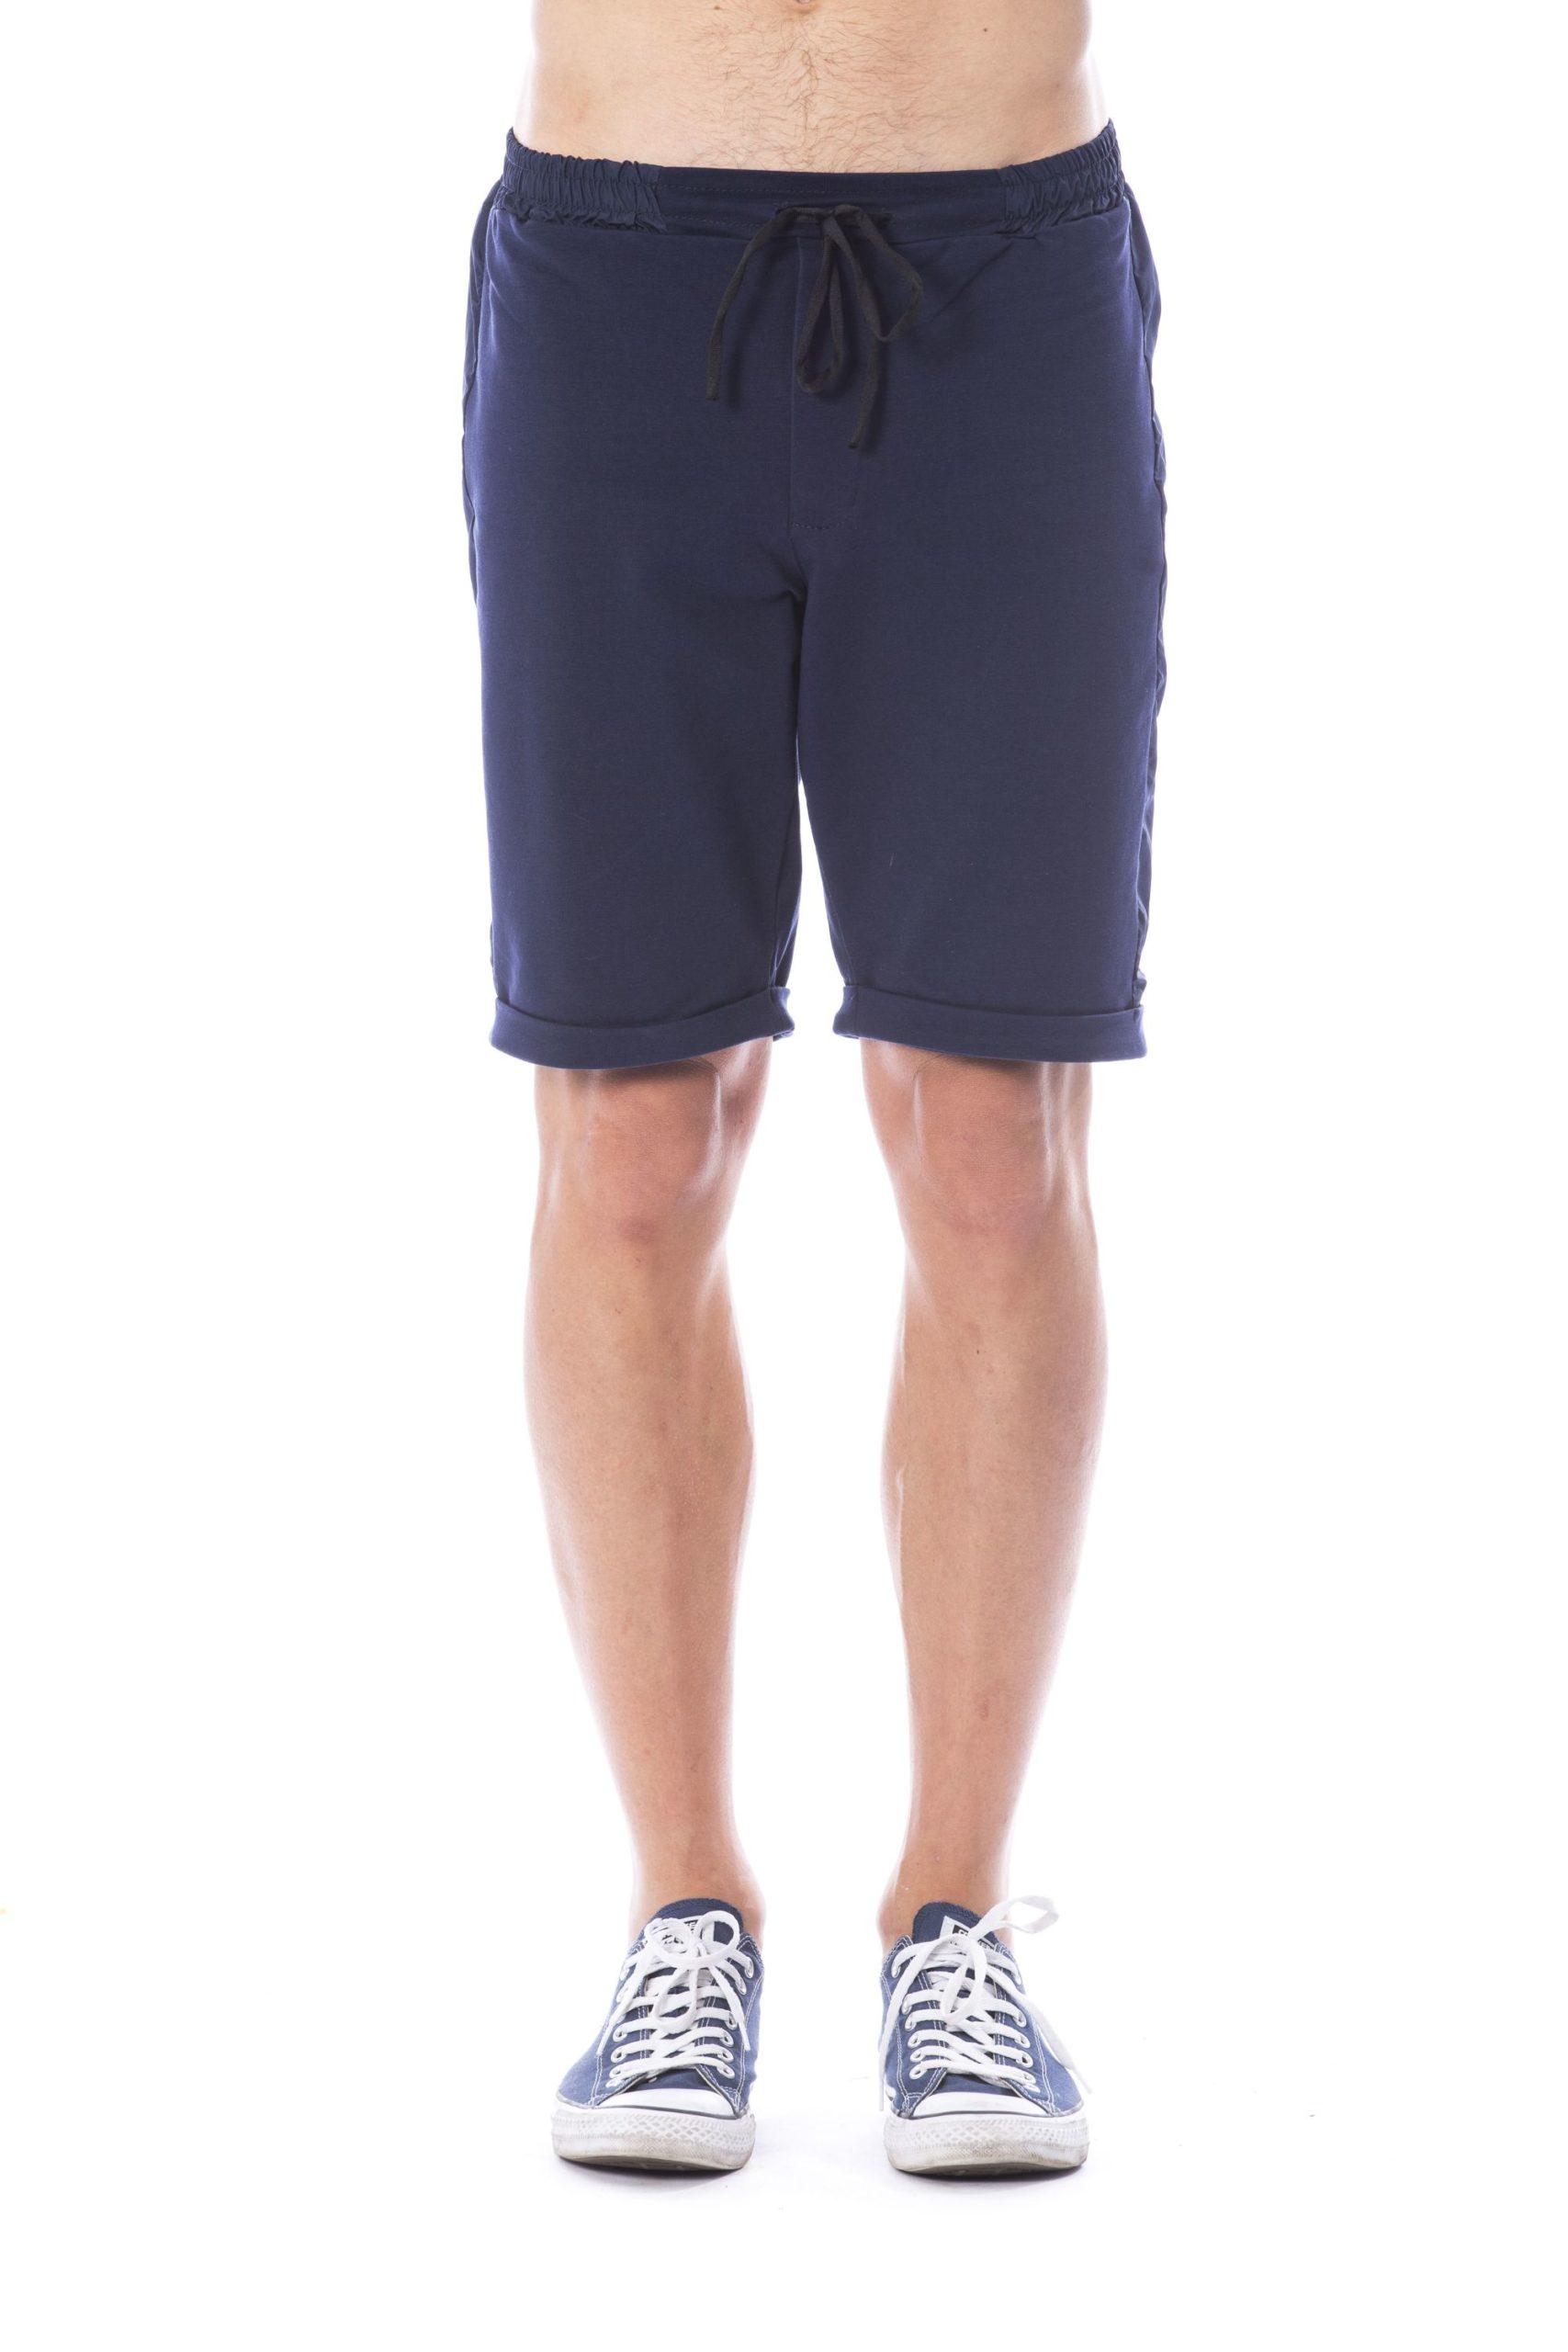 Verri Men's Short Blue VE1263252 - XL